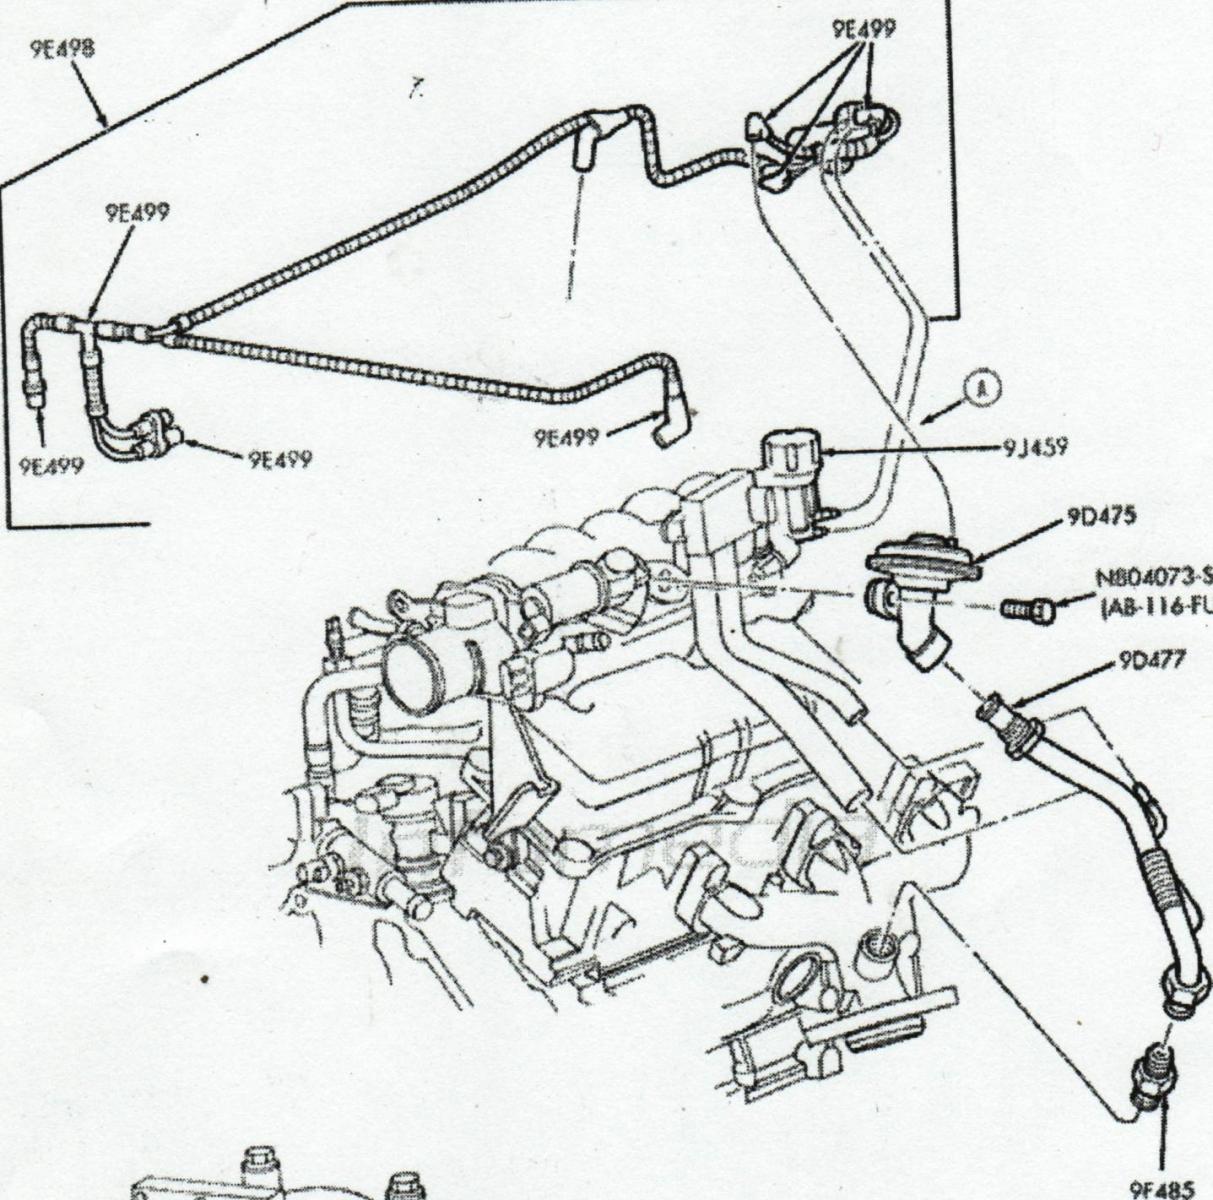 2003 taurus sel fuel tank question page 2 taurus car club of rh taurusclub 2003